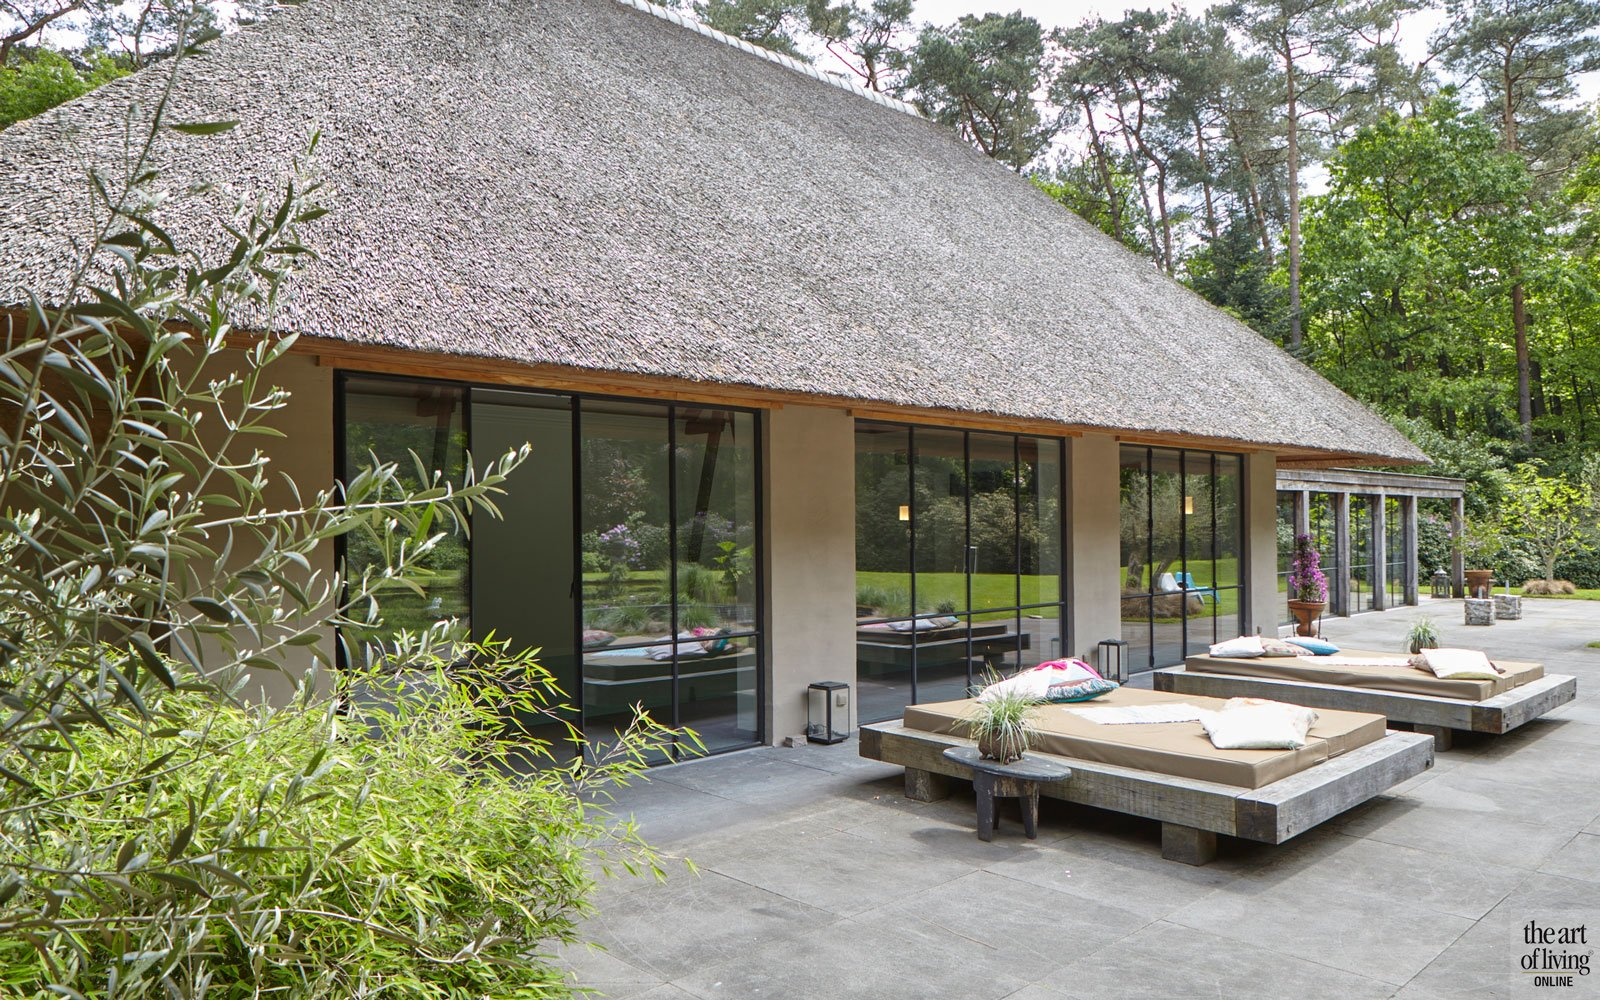 Jaren 70 villa, Eric kant, the art of living, wellness at home, wellness, zwembad, lifestyle, fitness, luxueus, exclusief, villa, pool house